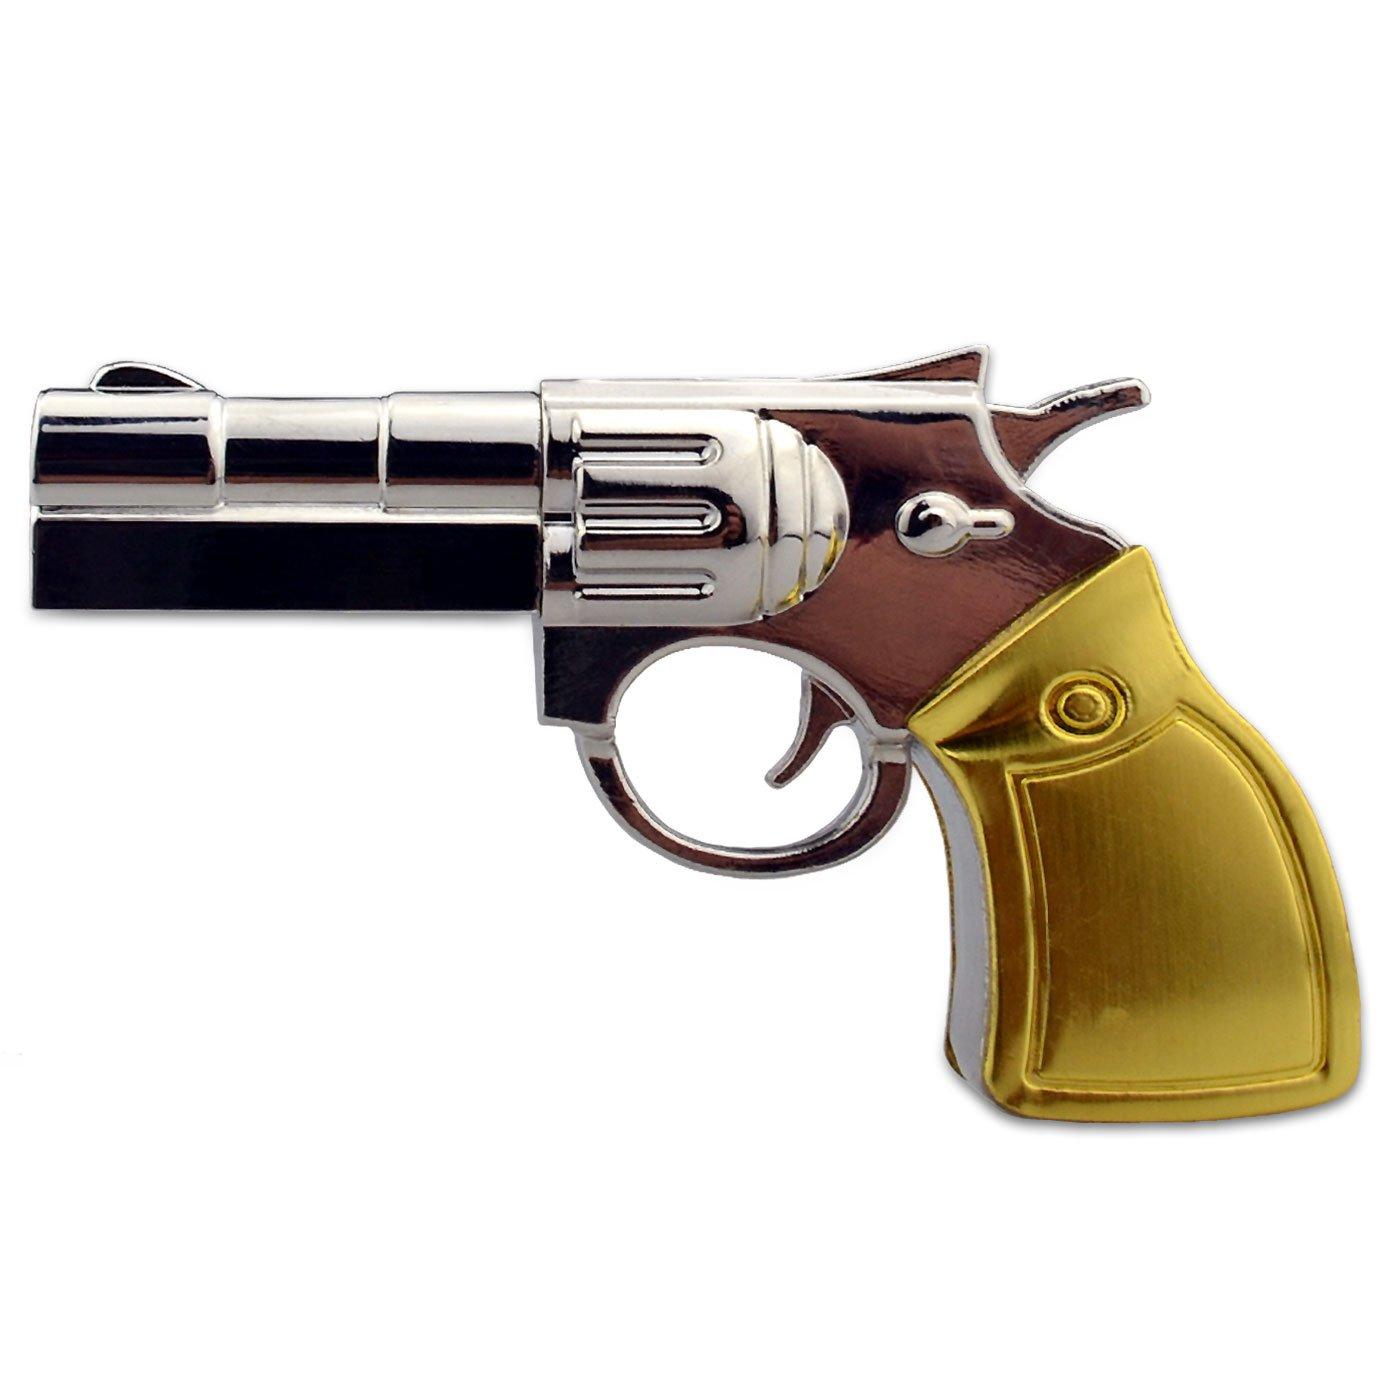 Tienda 818 no1750001 USB Stick Pistola Revólver Metal 3D Oro ...